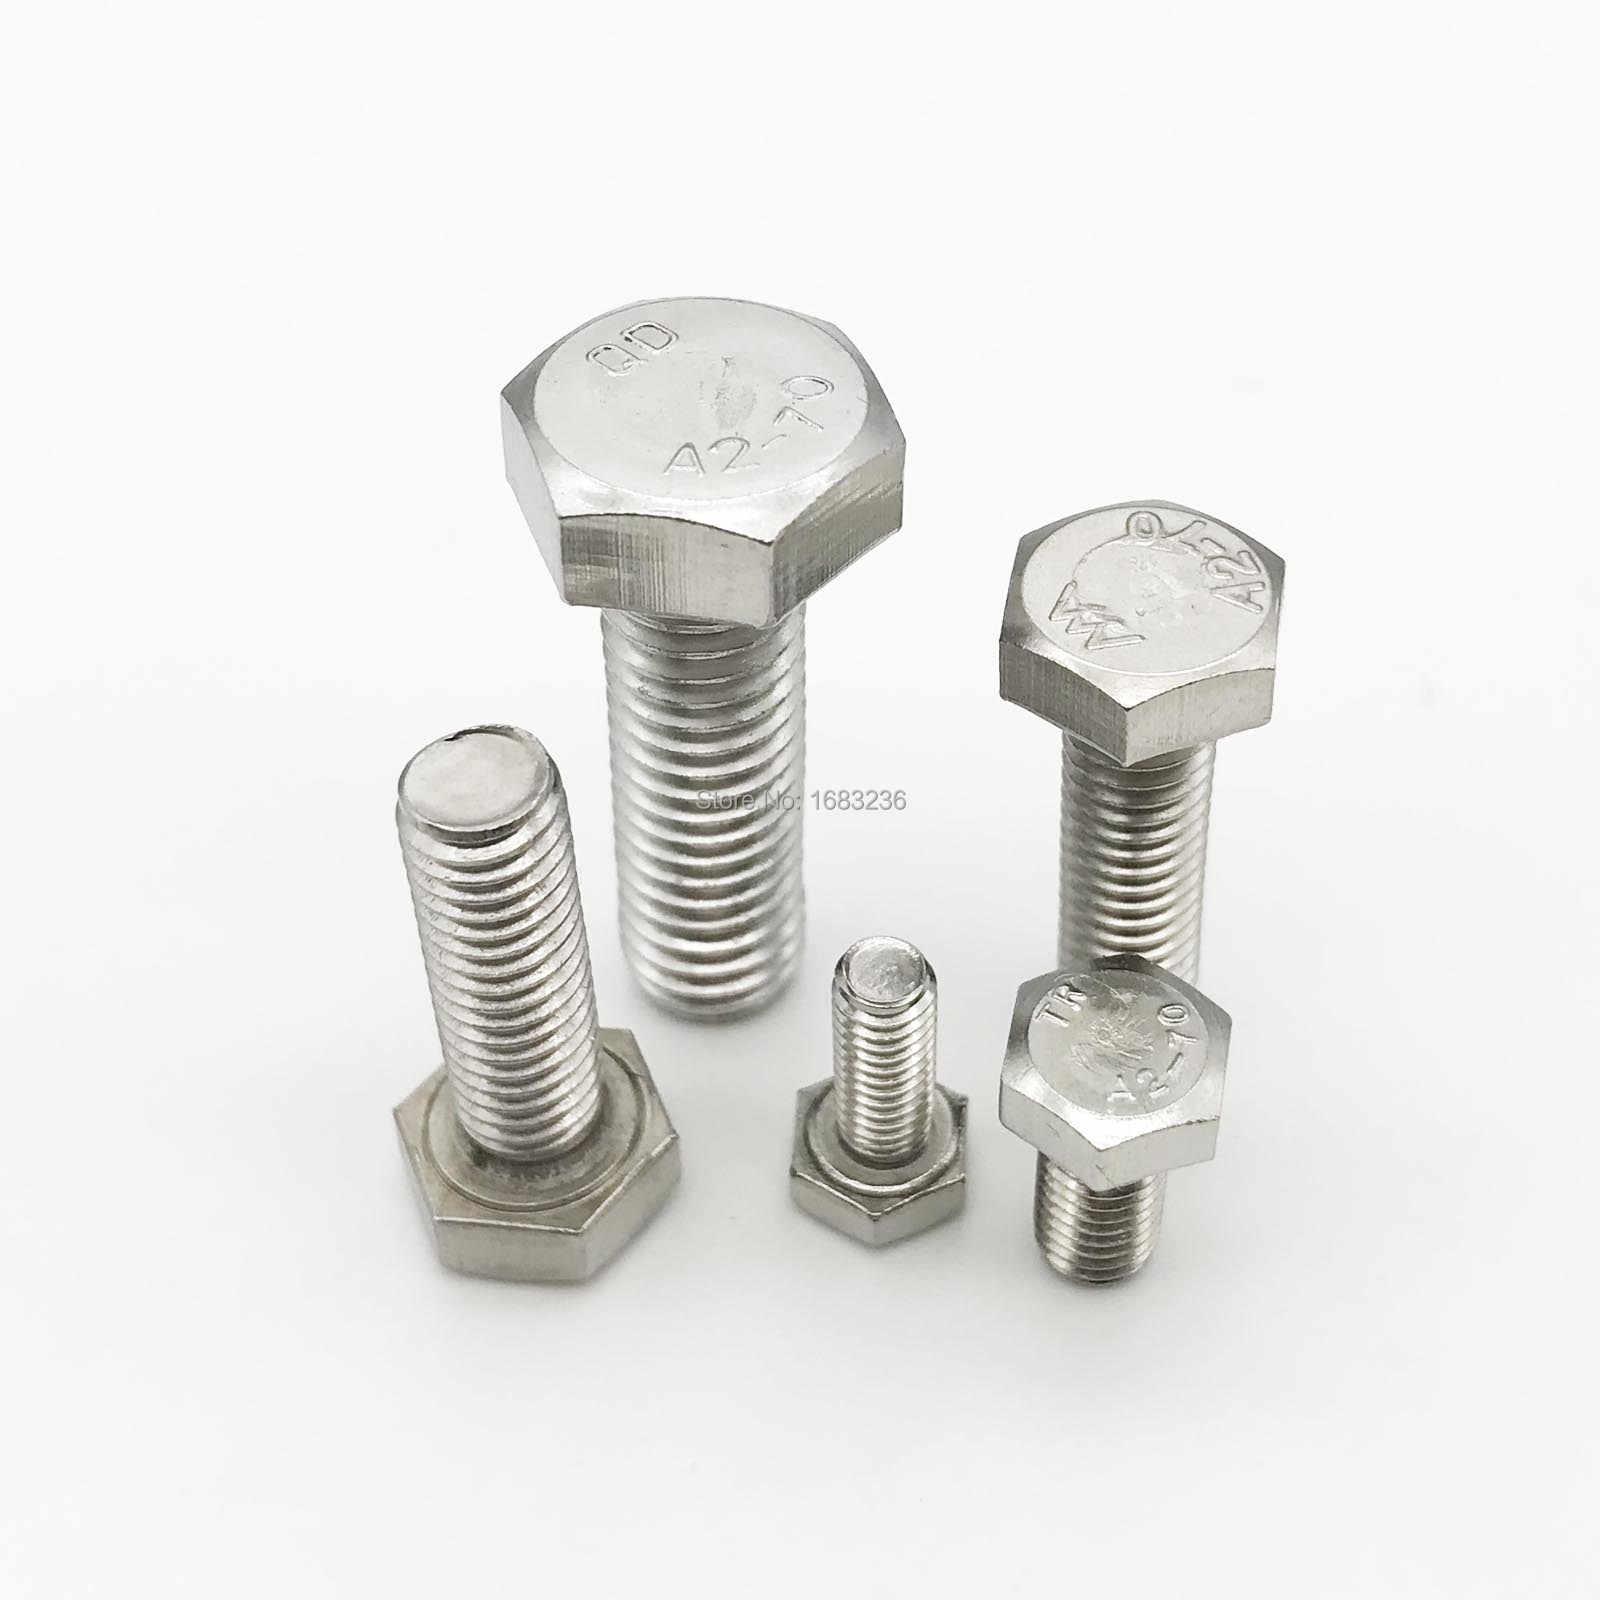 St@llion M10 A2 acero inoxidable Tornillos hexagonales de cabeza hexagonal de acero inoxidable con rosca DIN 933 M10x25mm